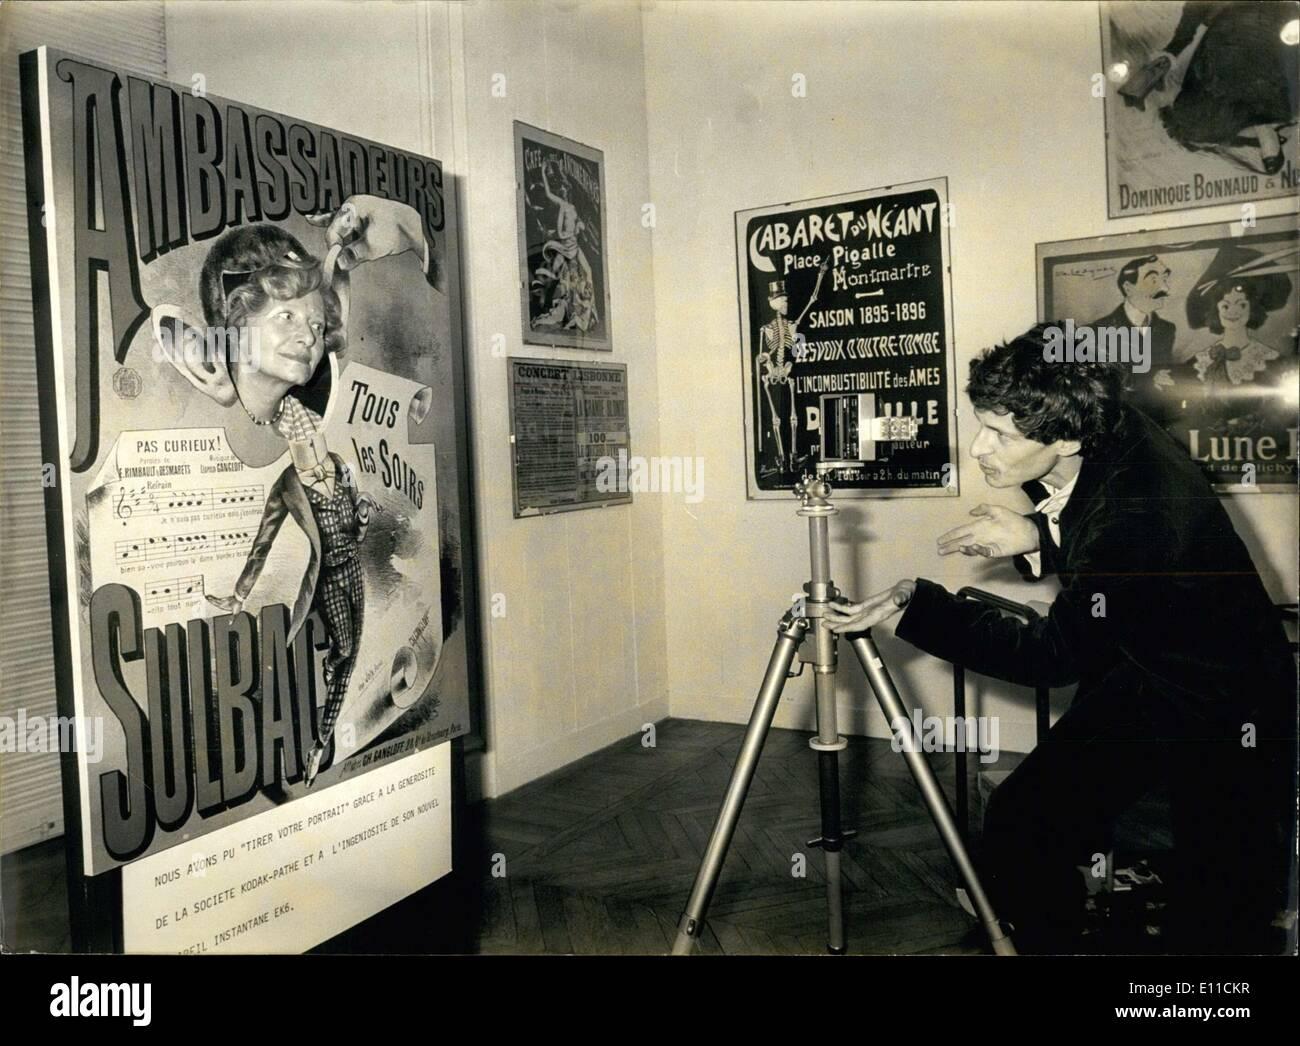 Gen 19, 1977 - Arti Decorative mostra a Parigi Immagini Stock